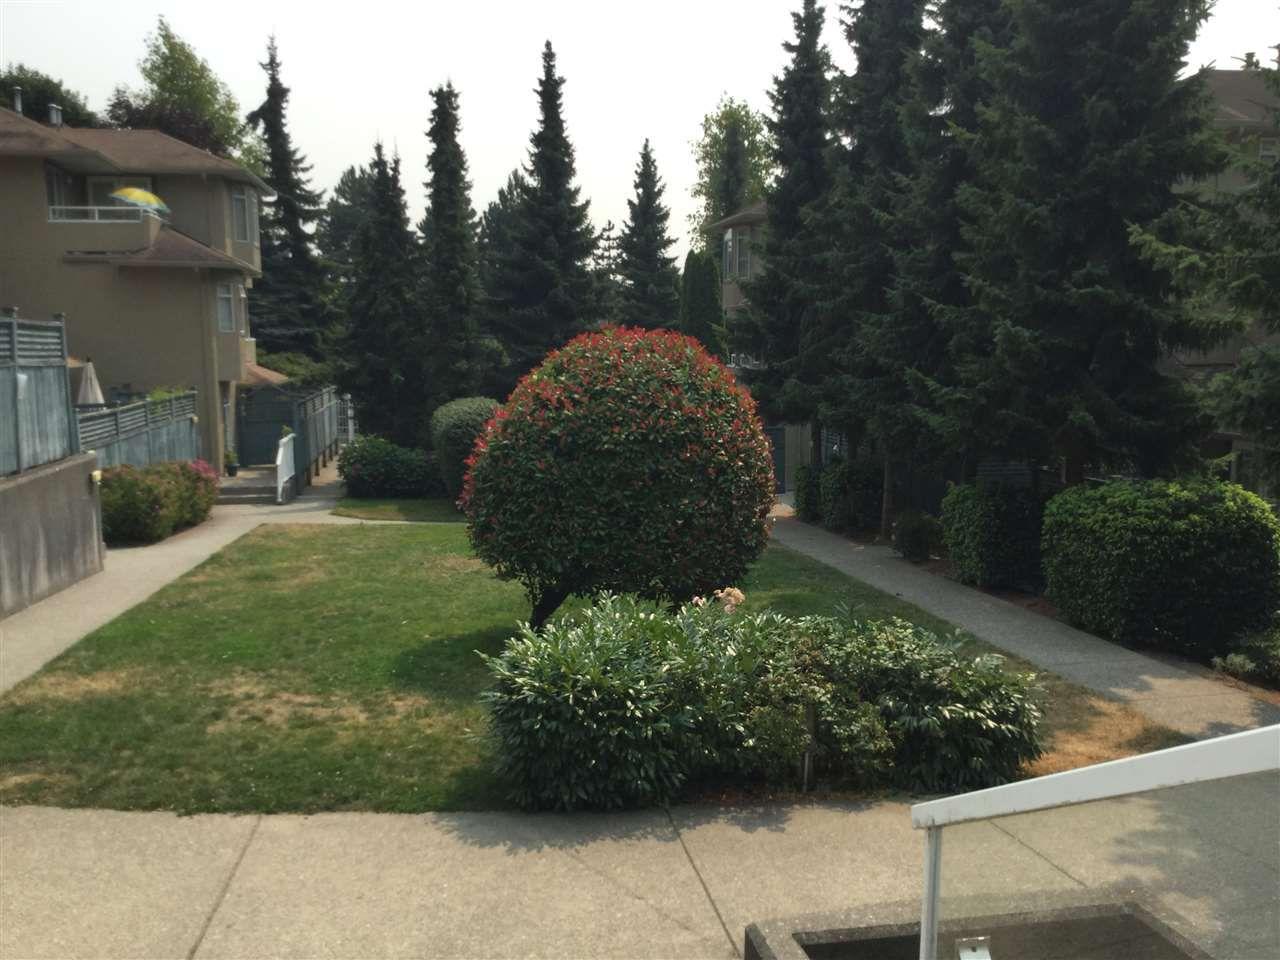 "Main Photo: 15 7188 EDMONDS Street in Burnaby: Edmonds BE Townhouse for sale in ""SYLVAN COURT"" (Burnaby East)  : MLS®# R2196339"